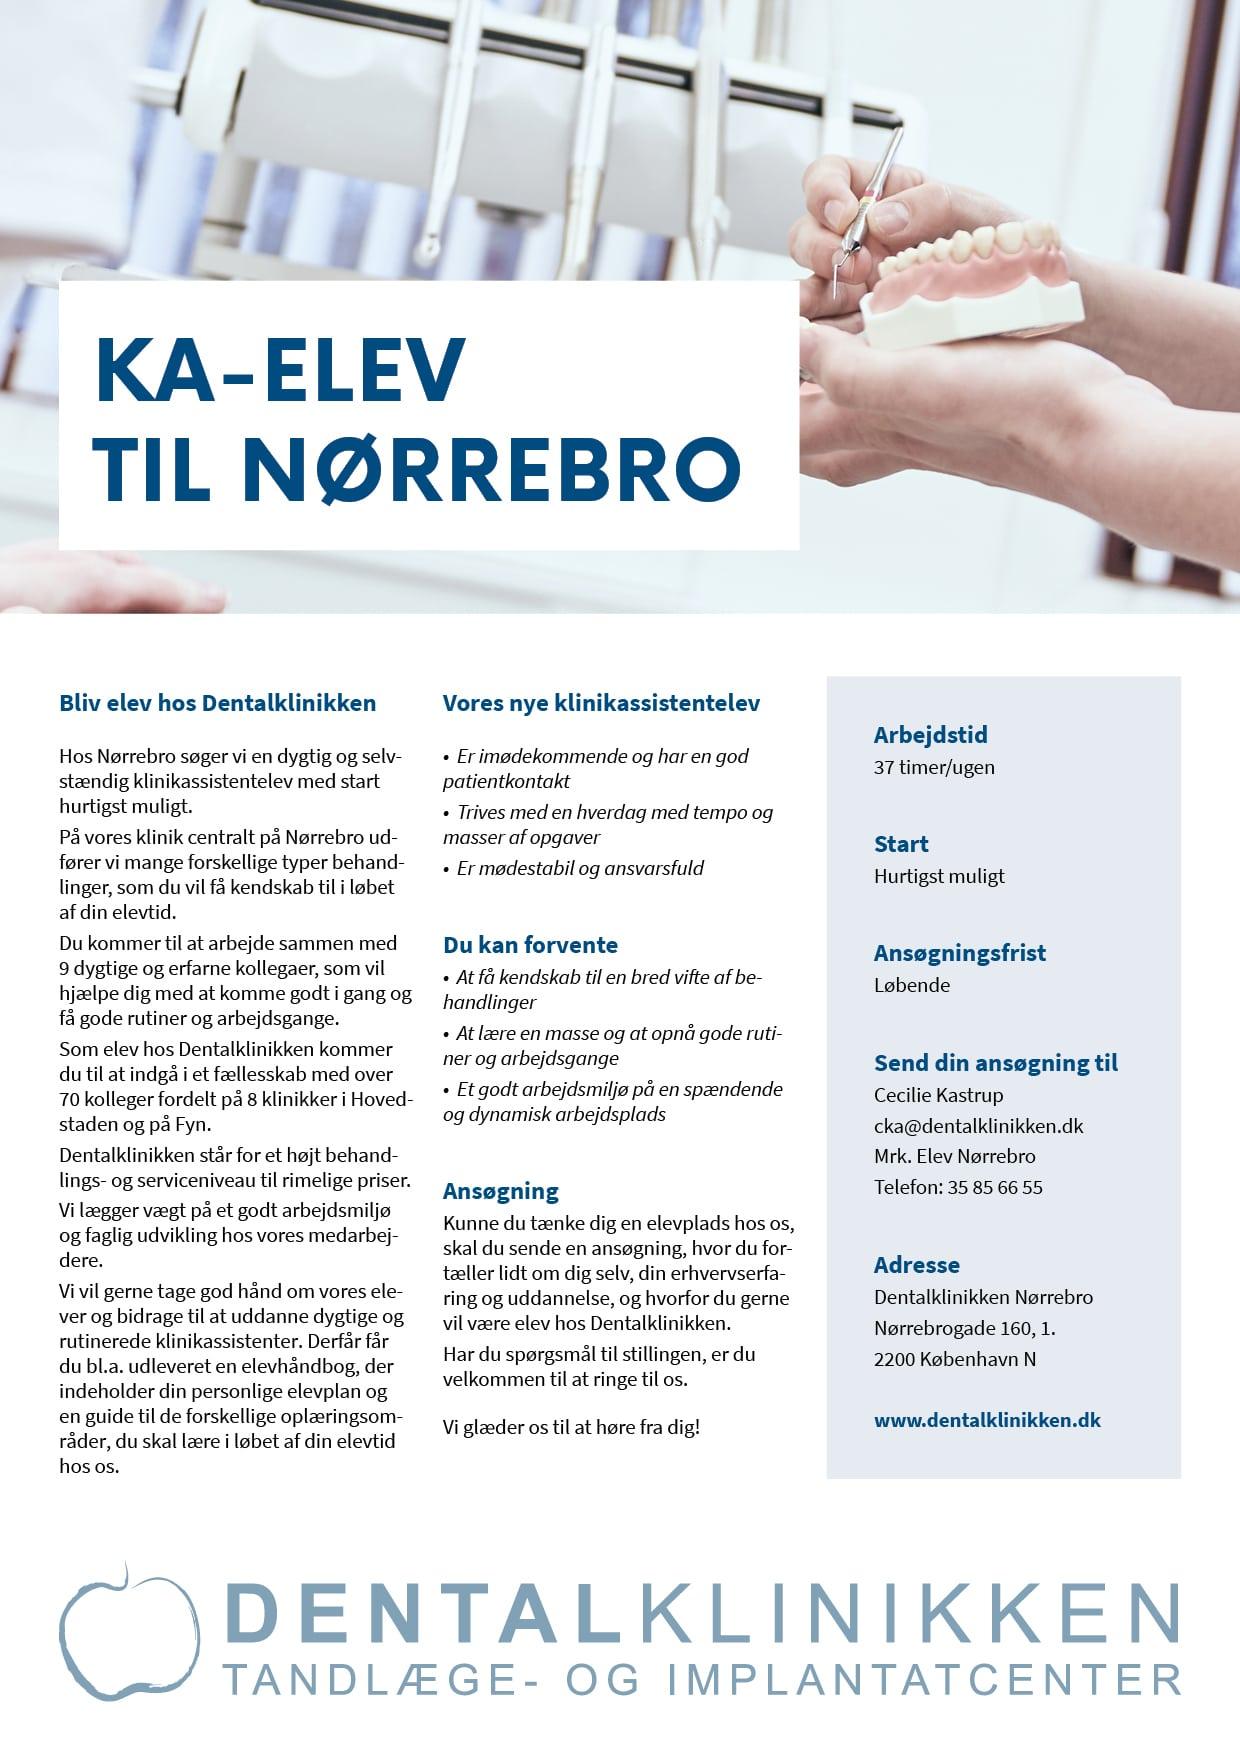 KA-elev Nørrebro